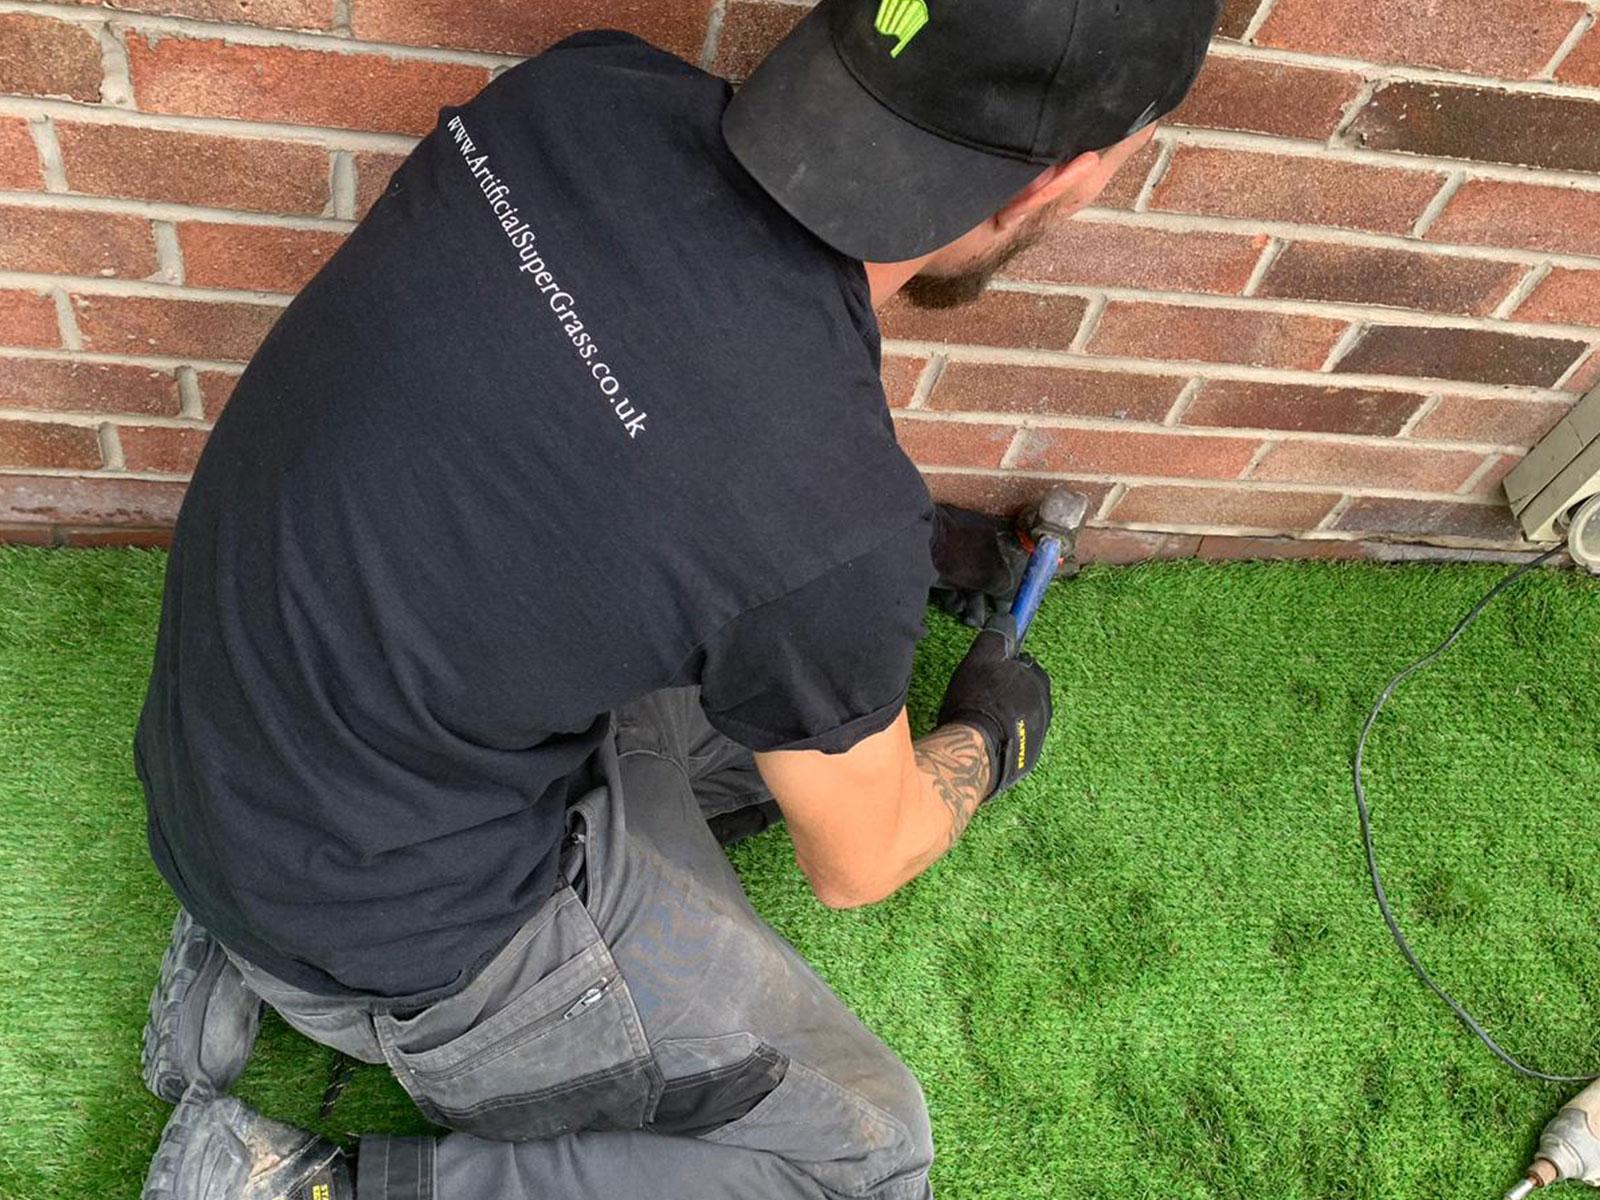 Artificial Grass for Dogs Gainsborough Artificial Super Grass